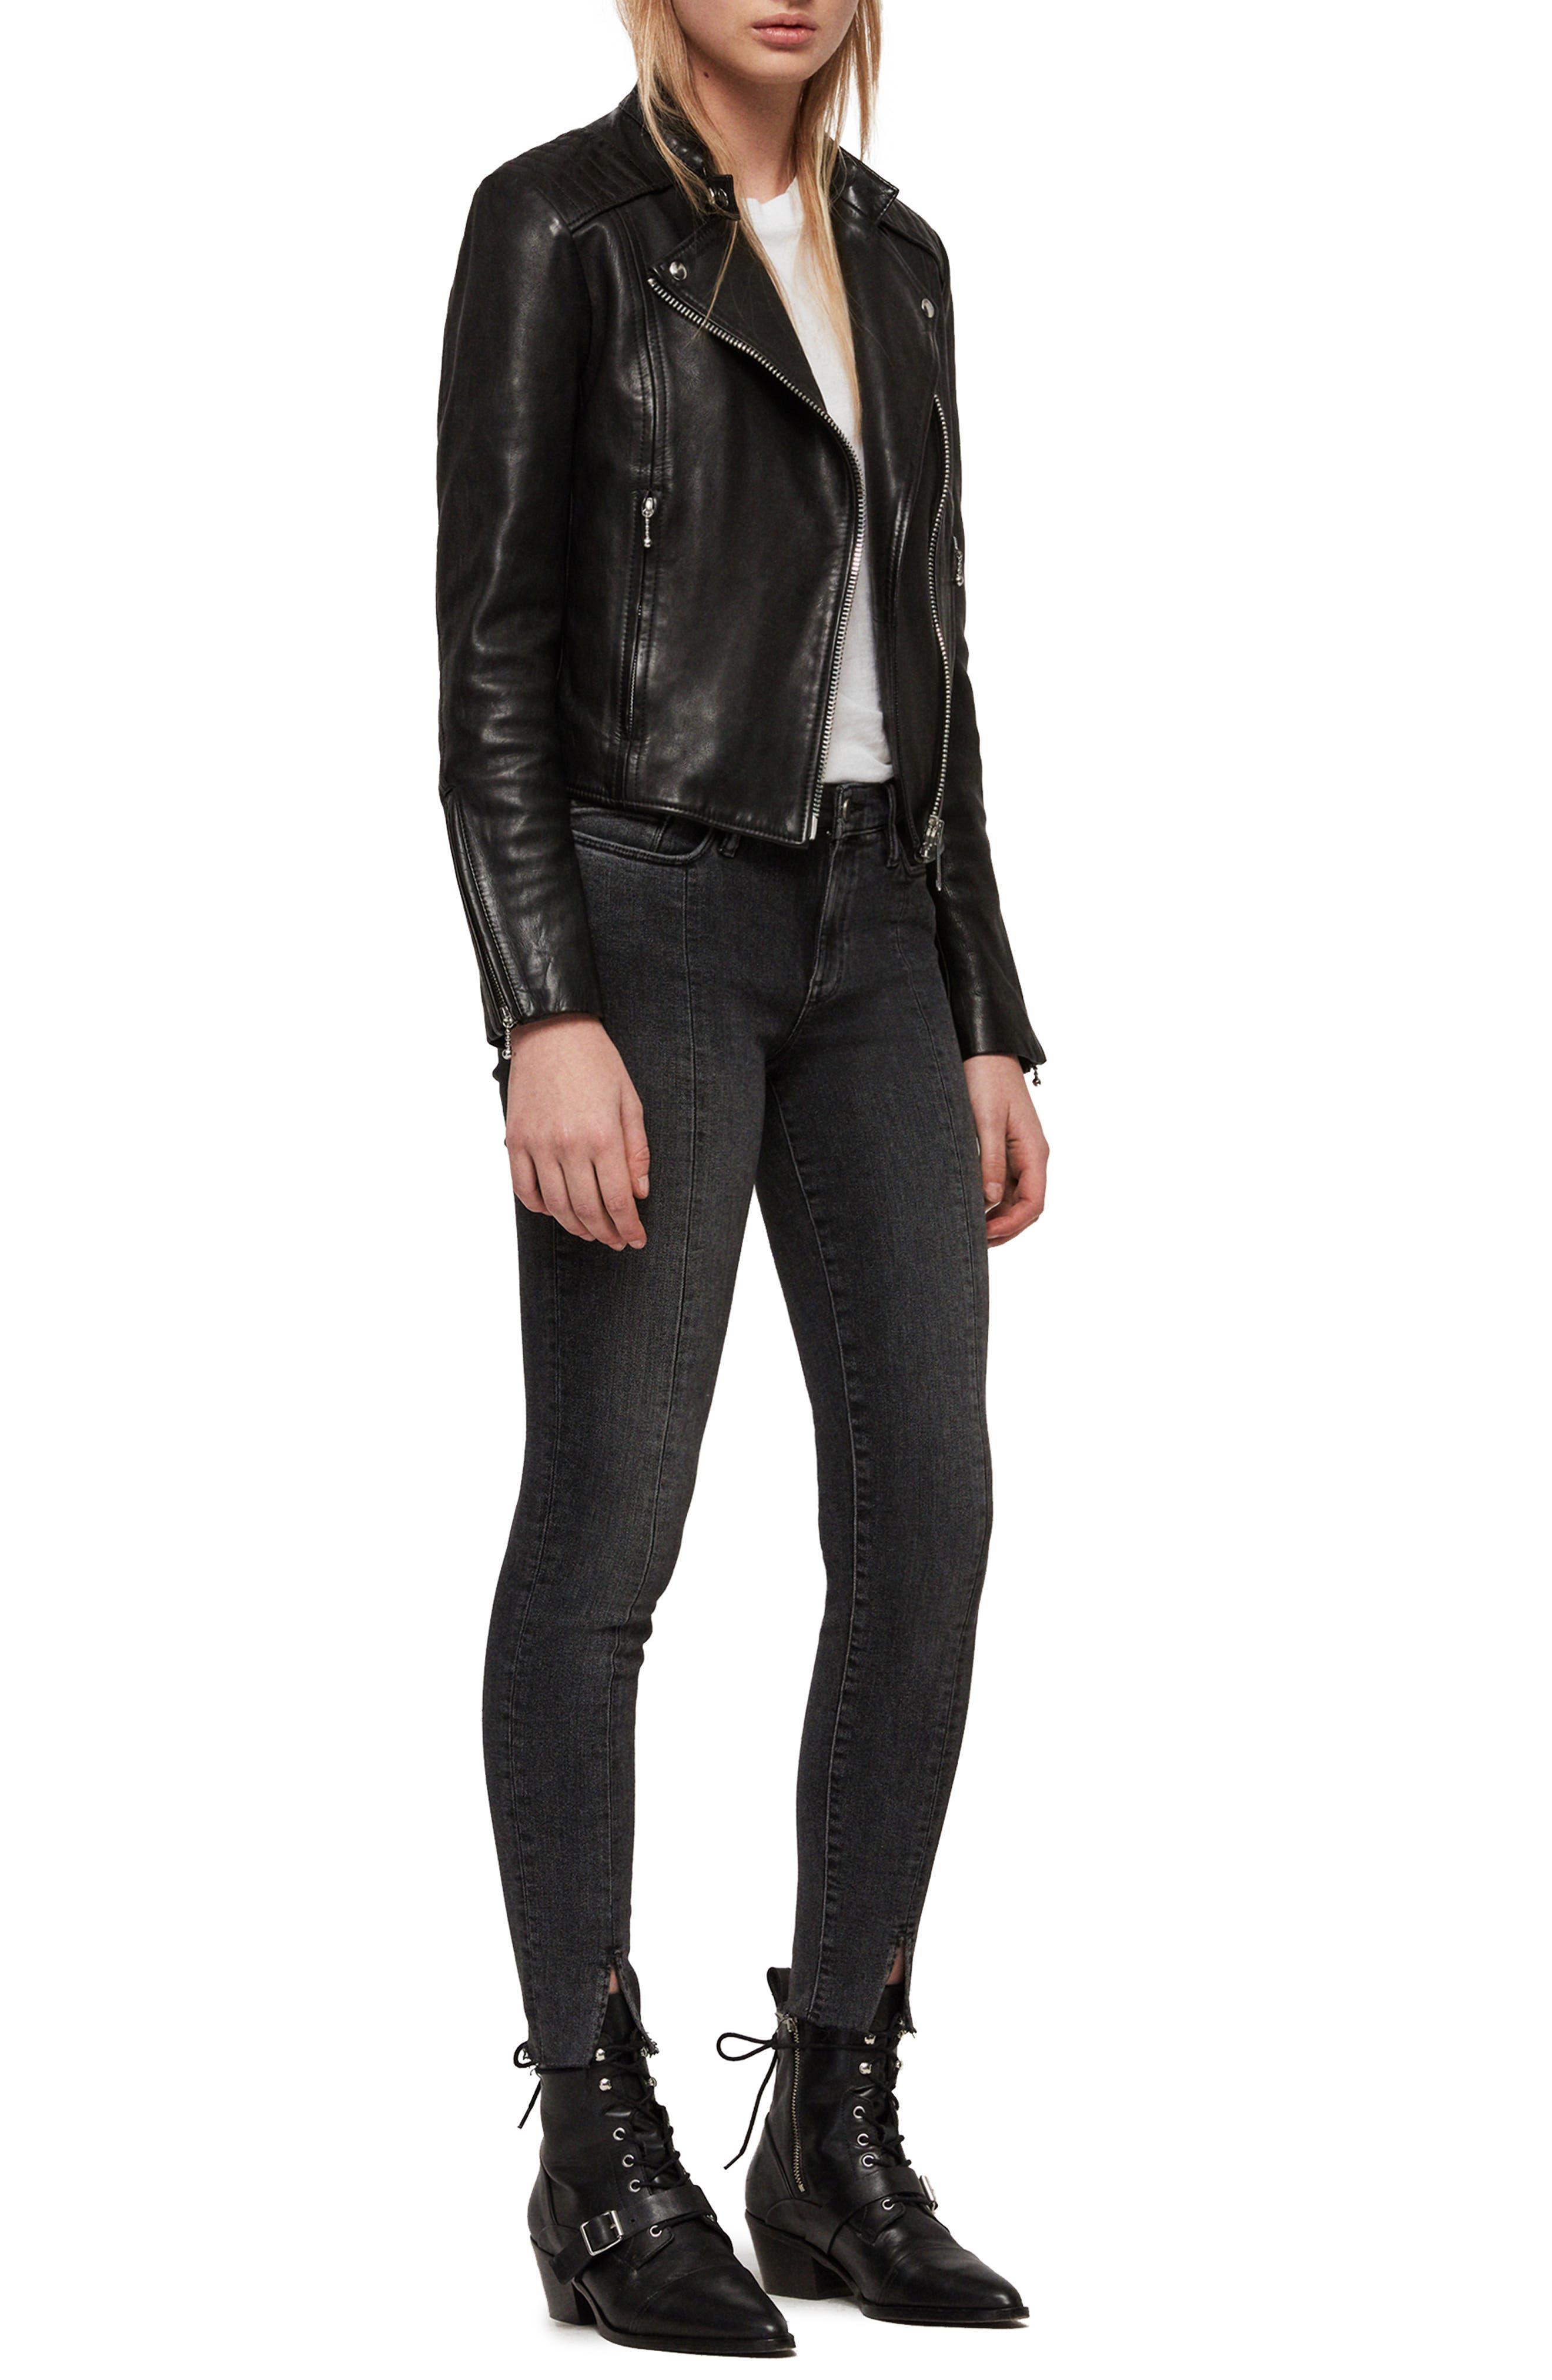 ALLSAINTS, Bircham Leather Biker Jacket, Alternate thumbnail 6, color, BLACK